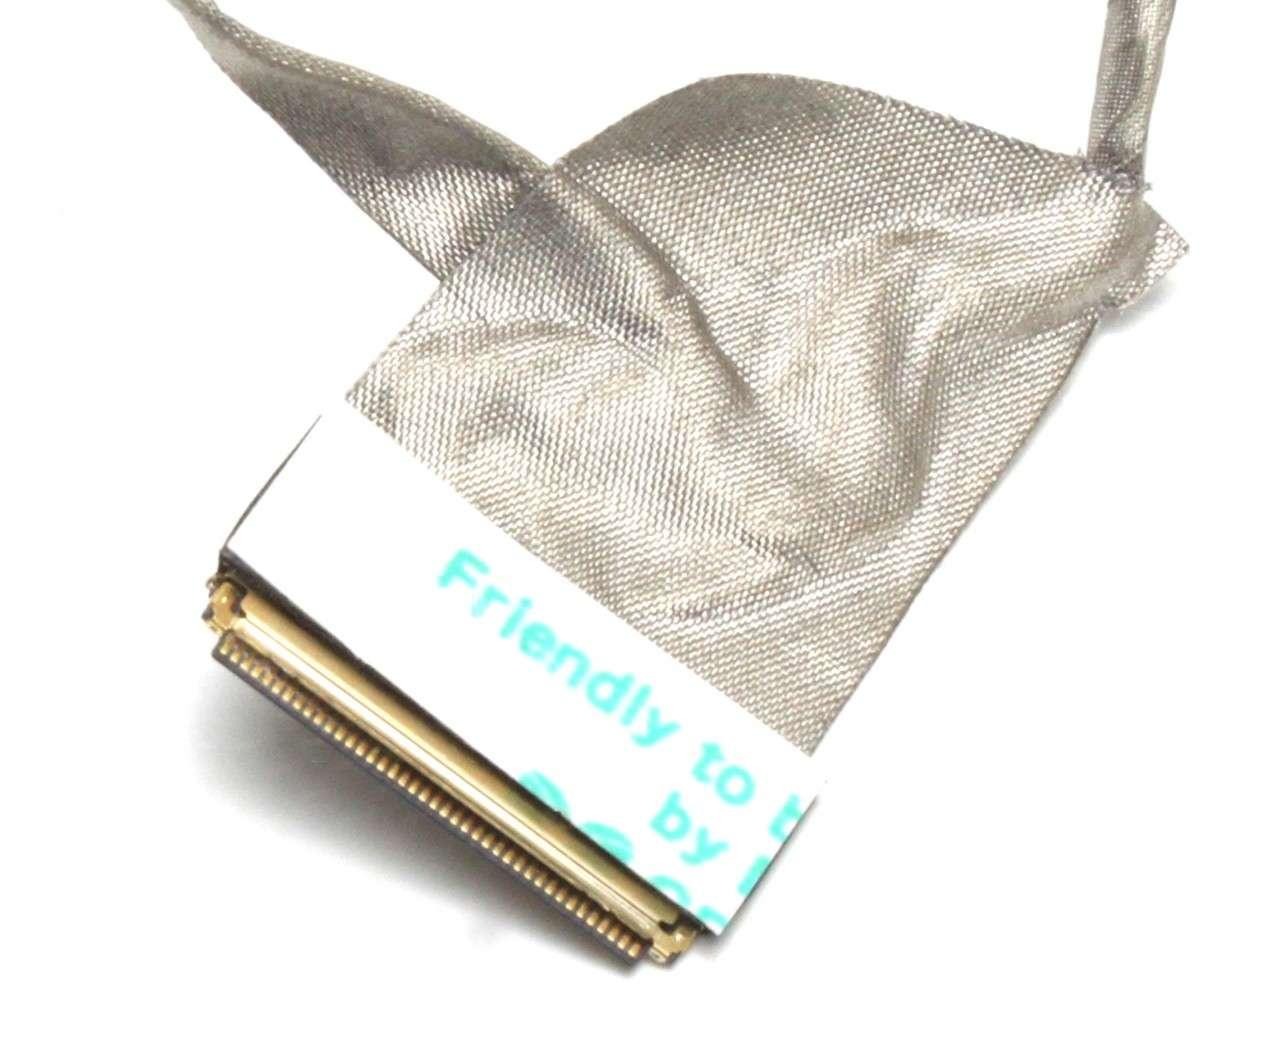 Cablu video LVDS Fujitsu DDFH2ALC010 imagine powerlaptop.ro 2021